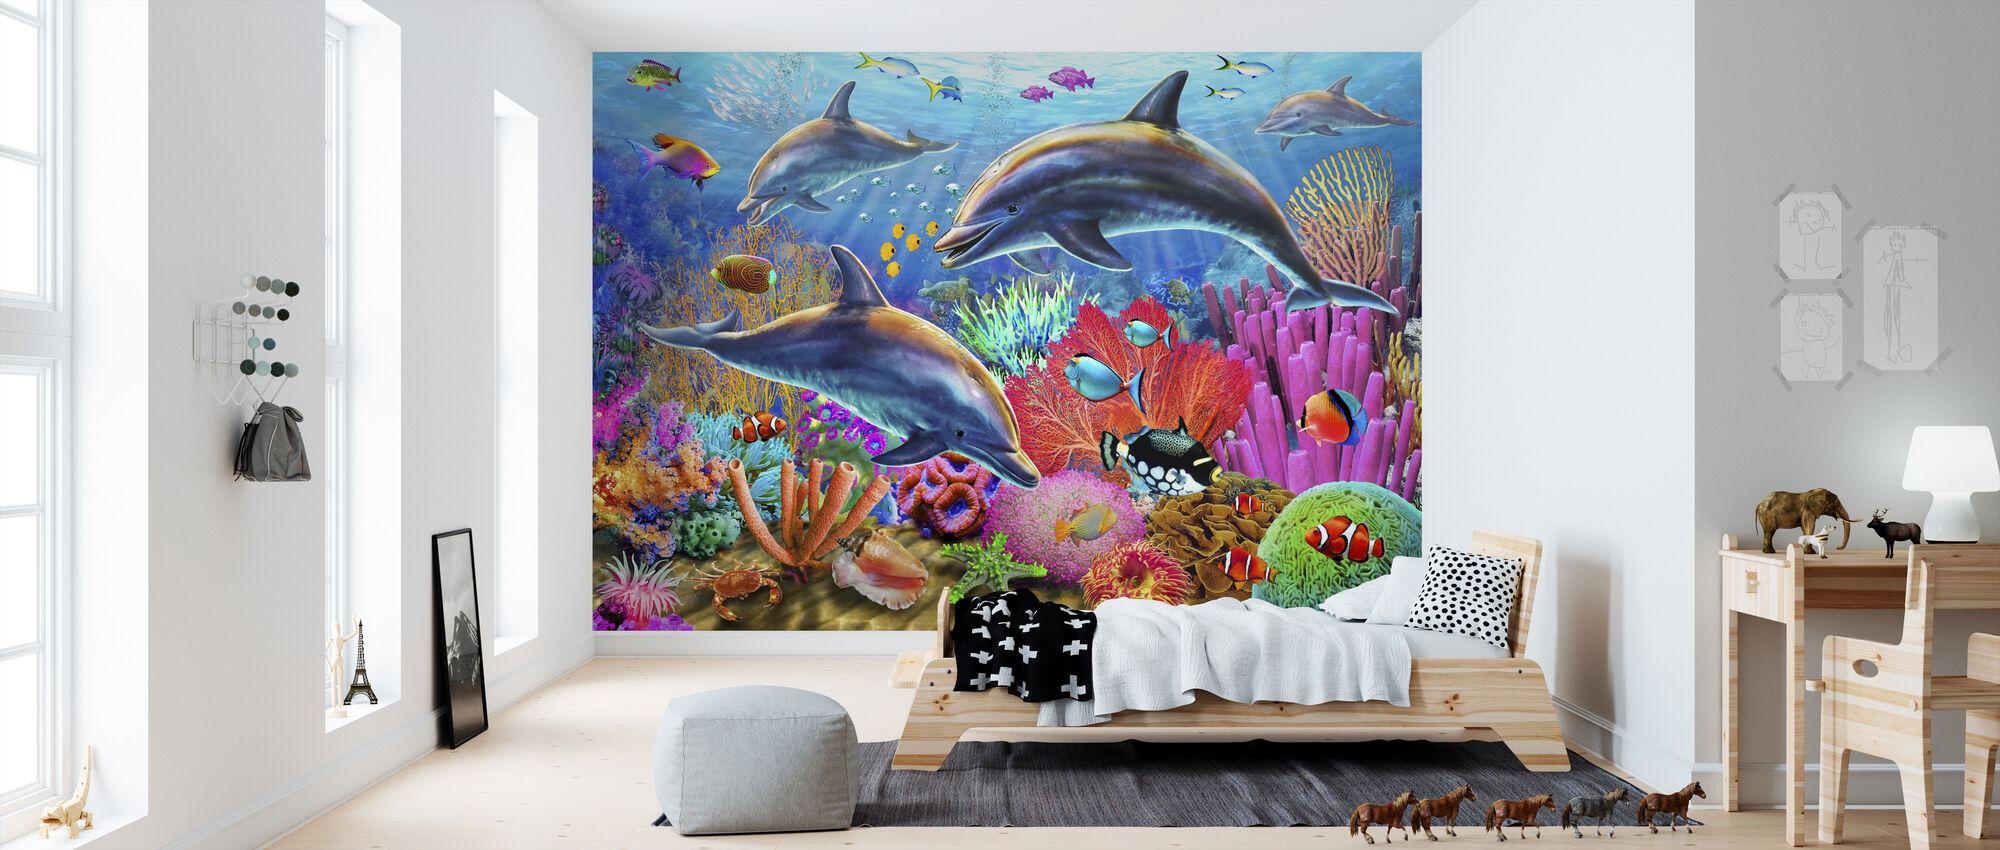 Dolphin Fun - Wallpaper - Kids Room